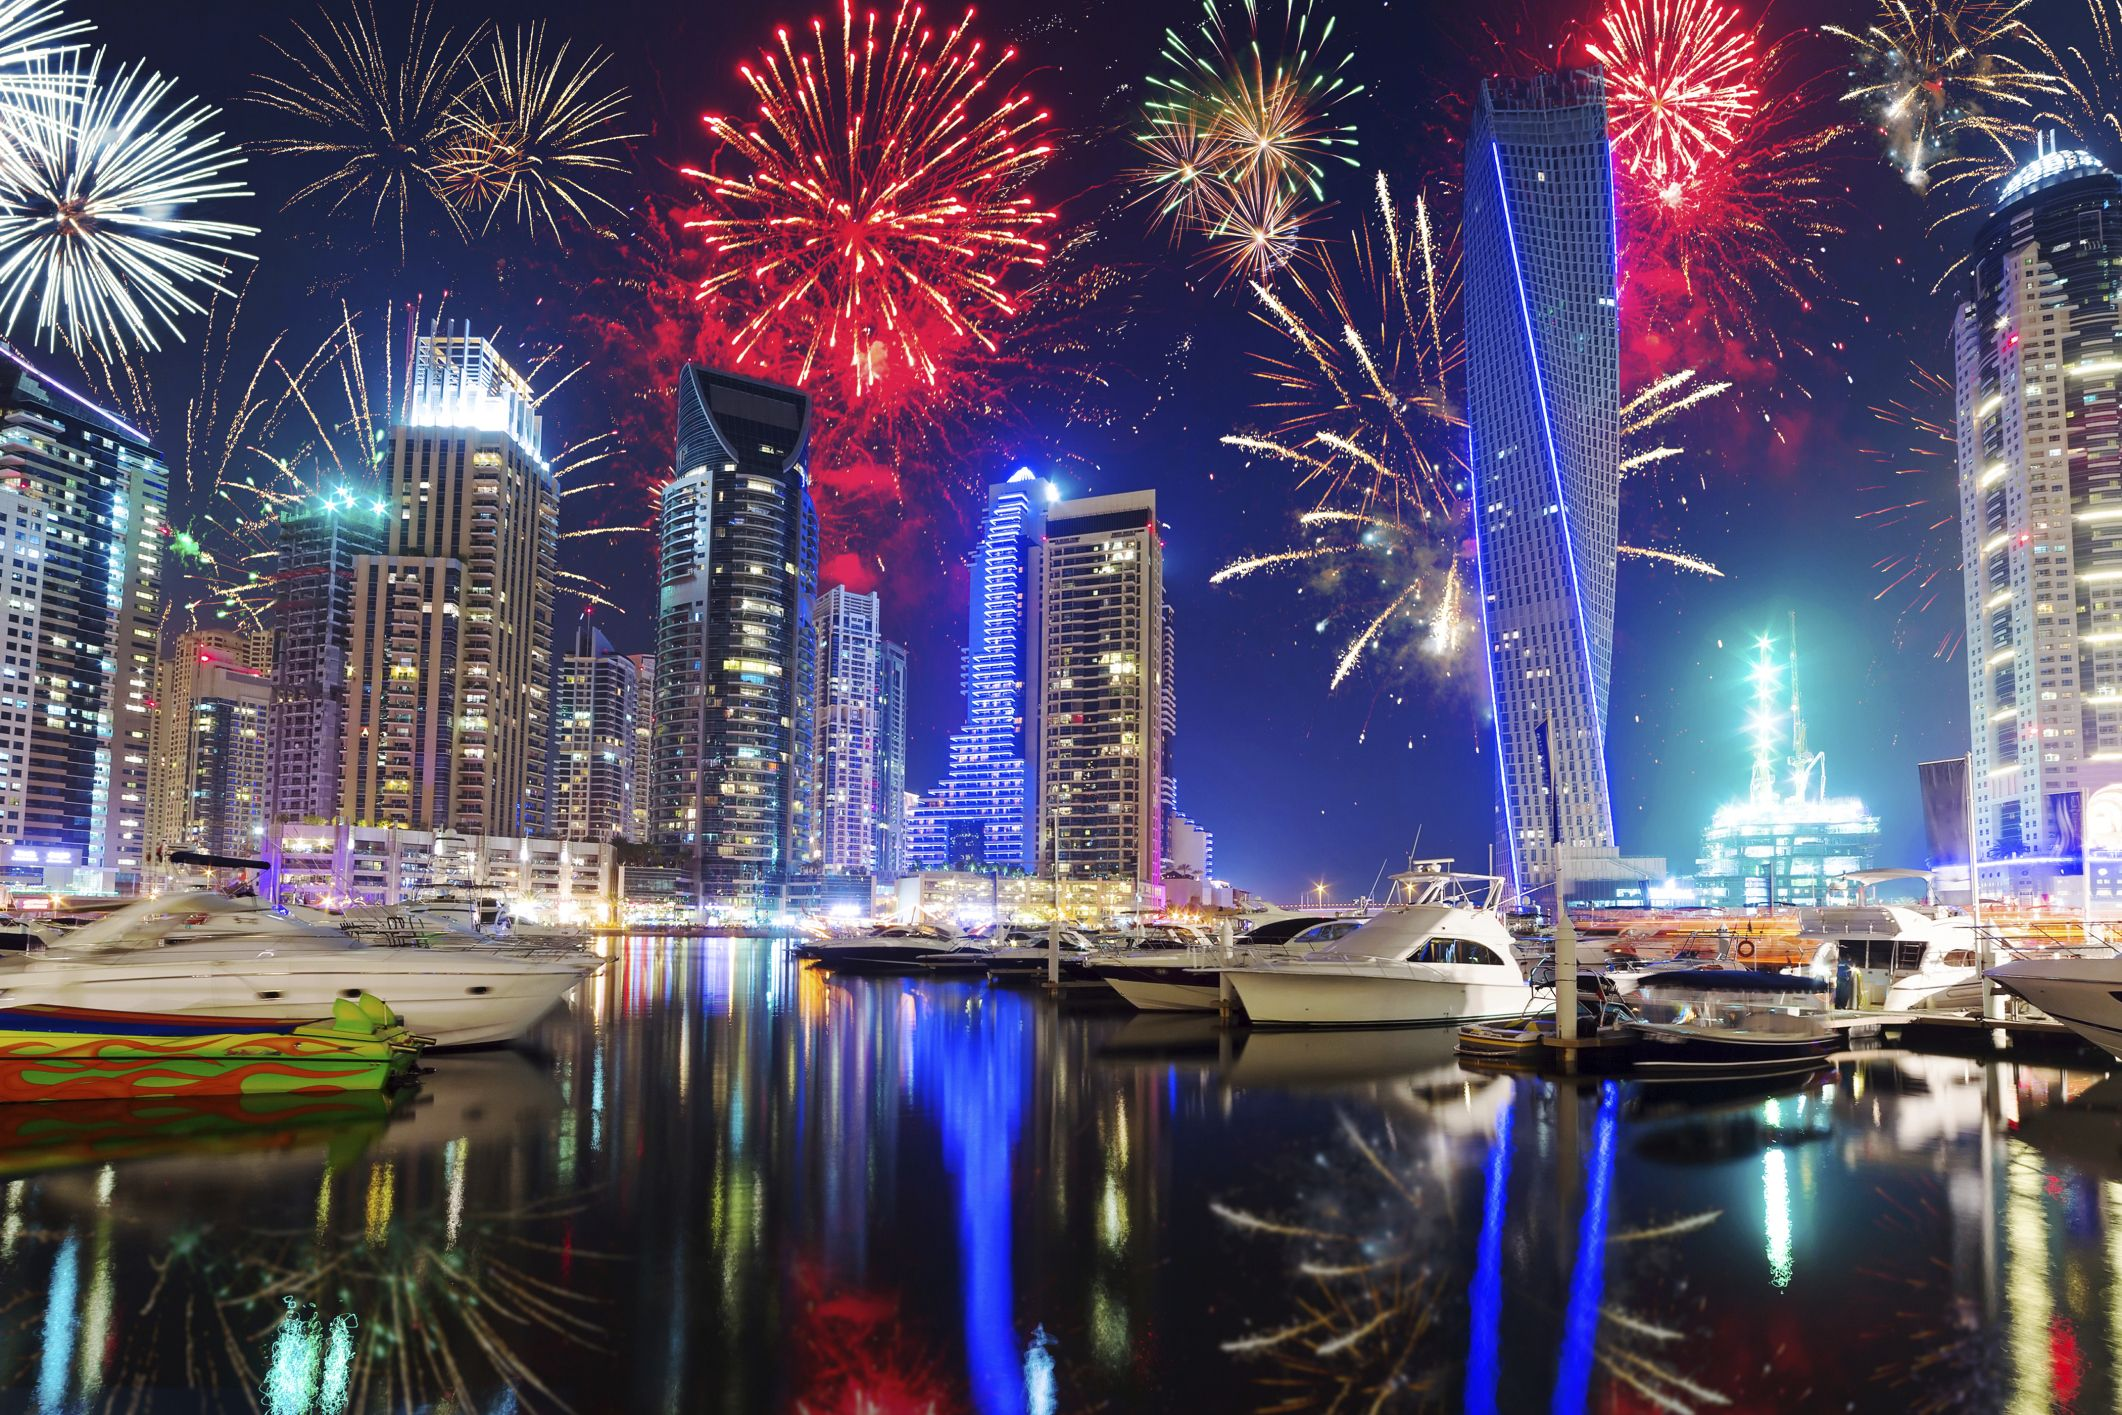 New Years Eve Celebration in Dubai New year fireworks